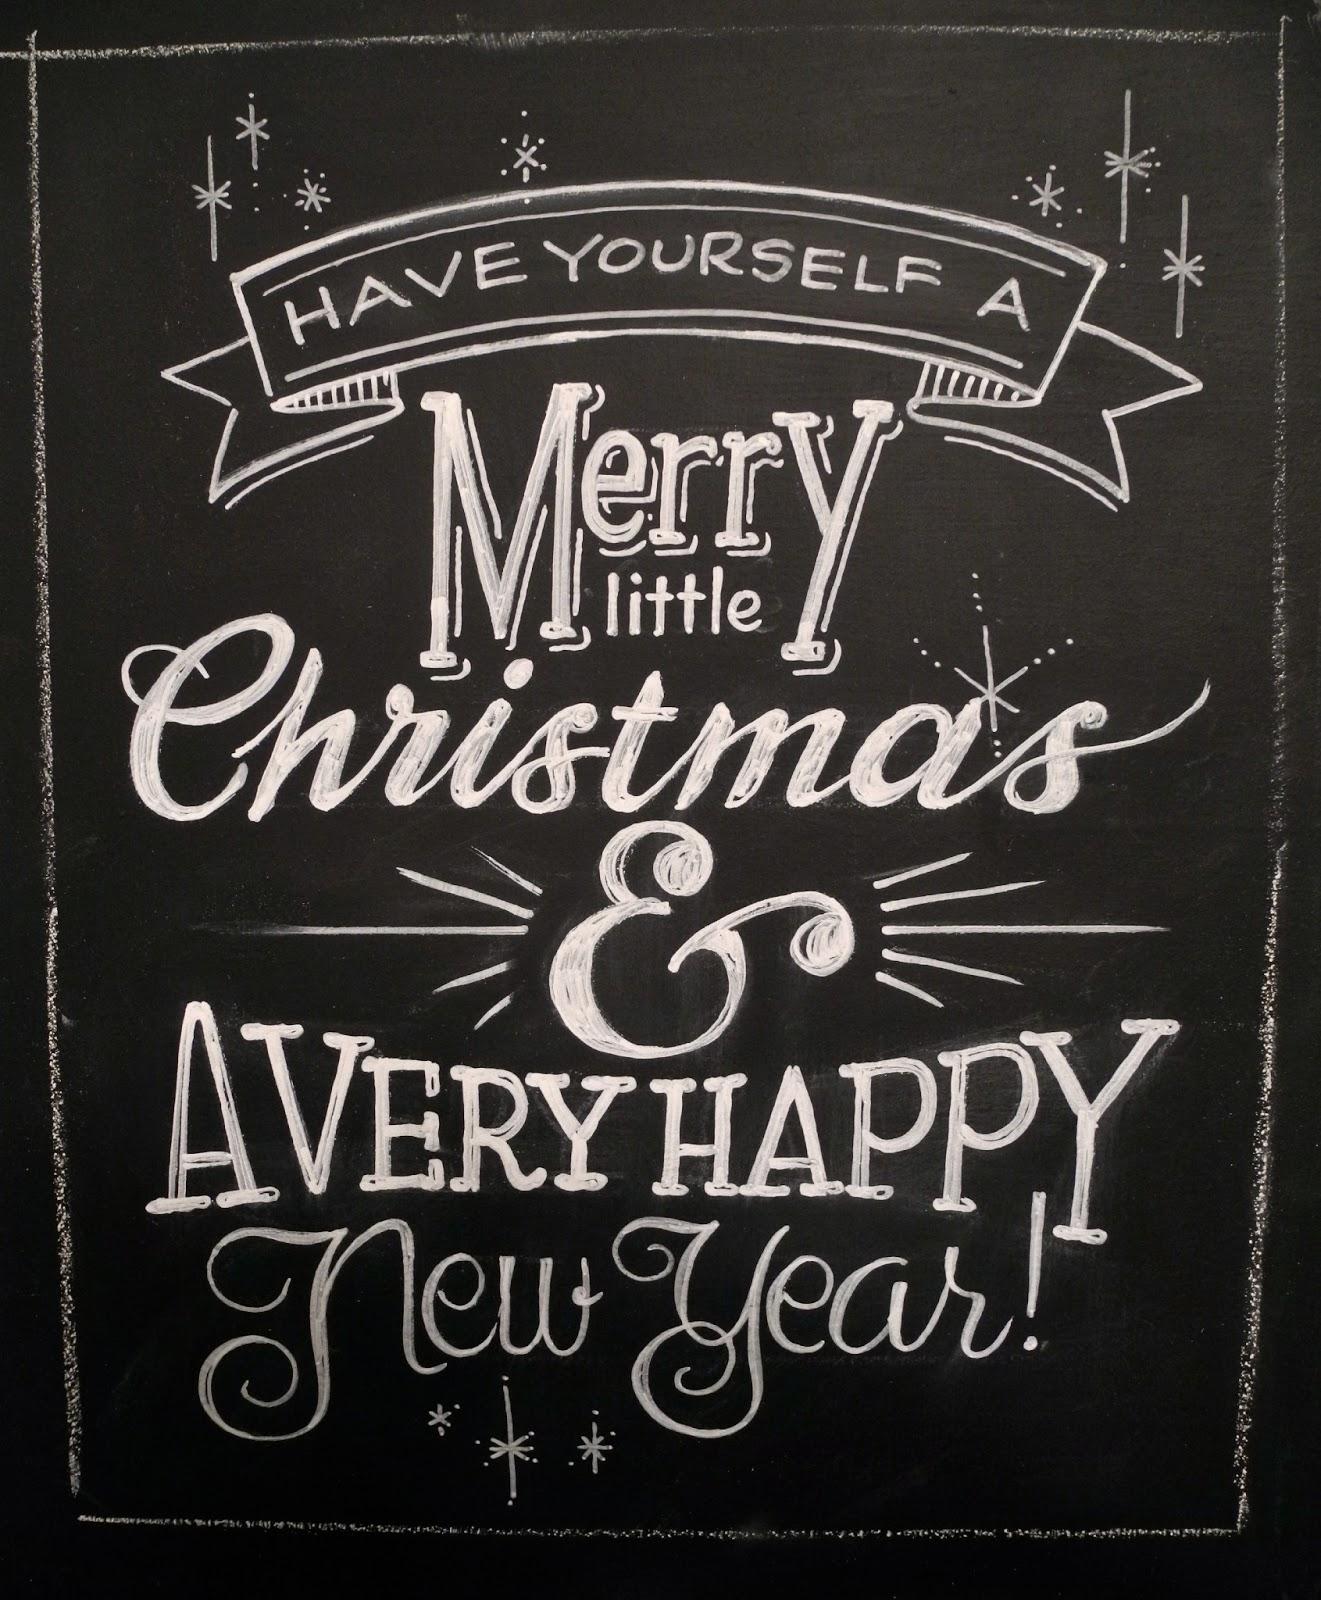 Seaglasssundays chalkboard christmas card Chalkboard typography